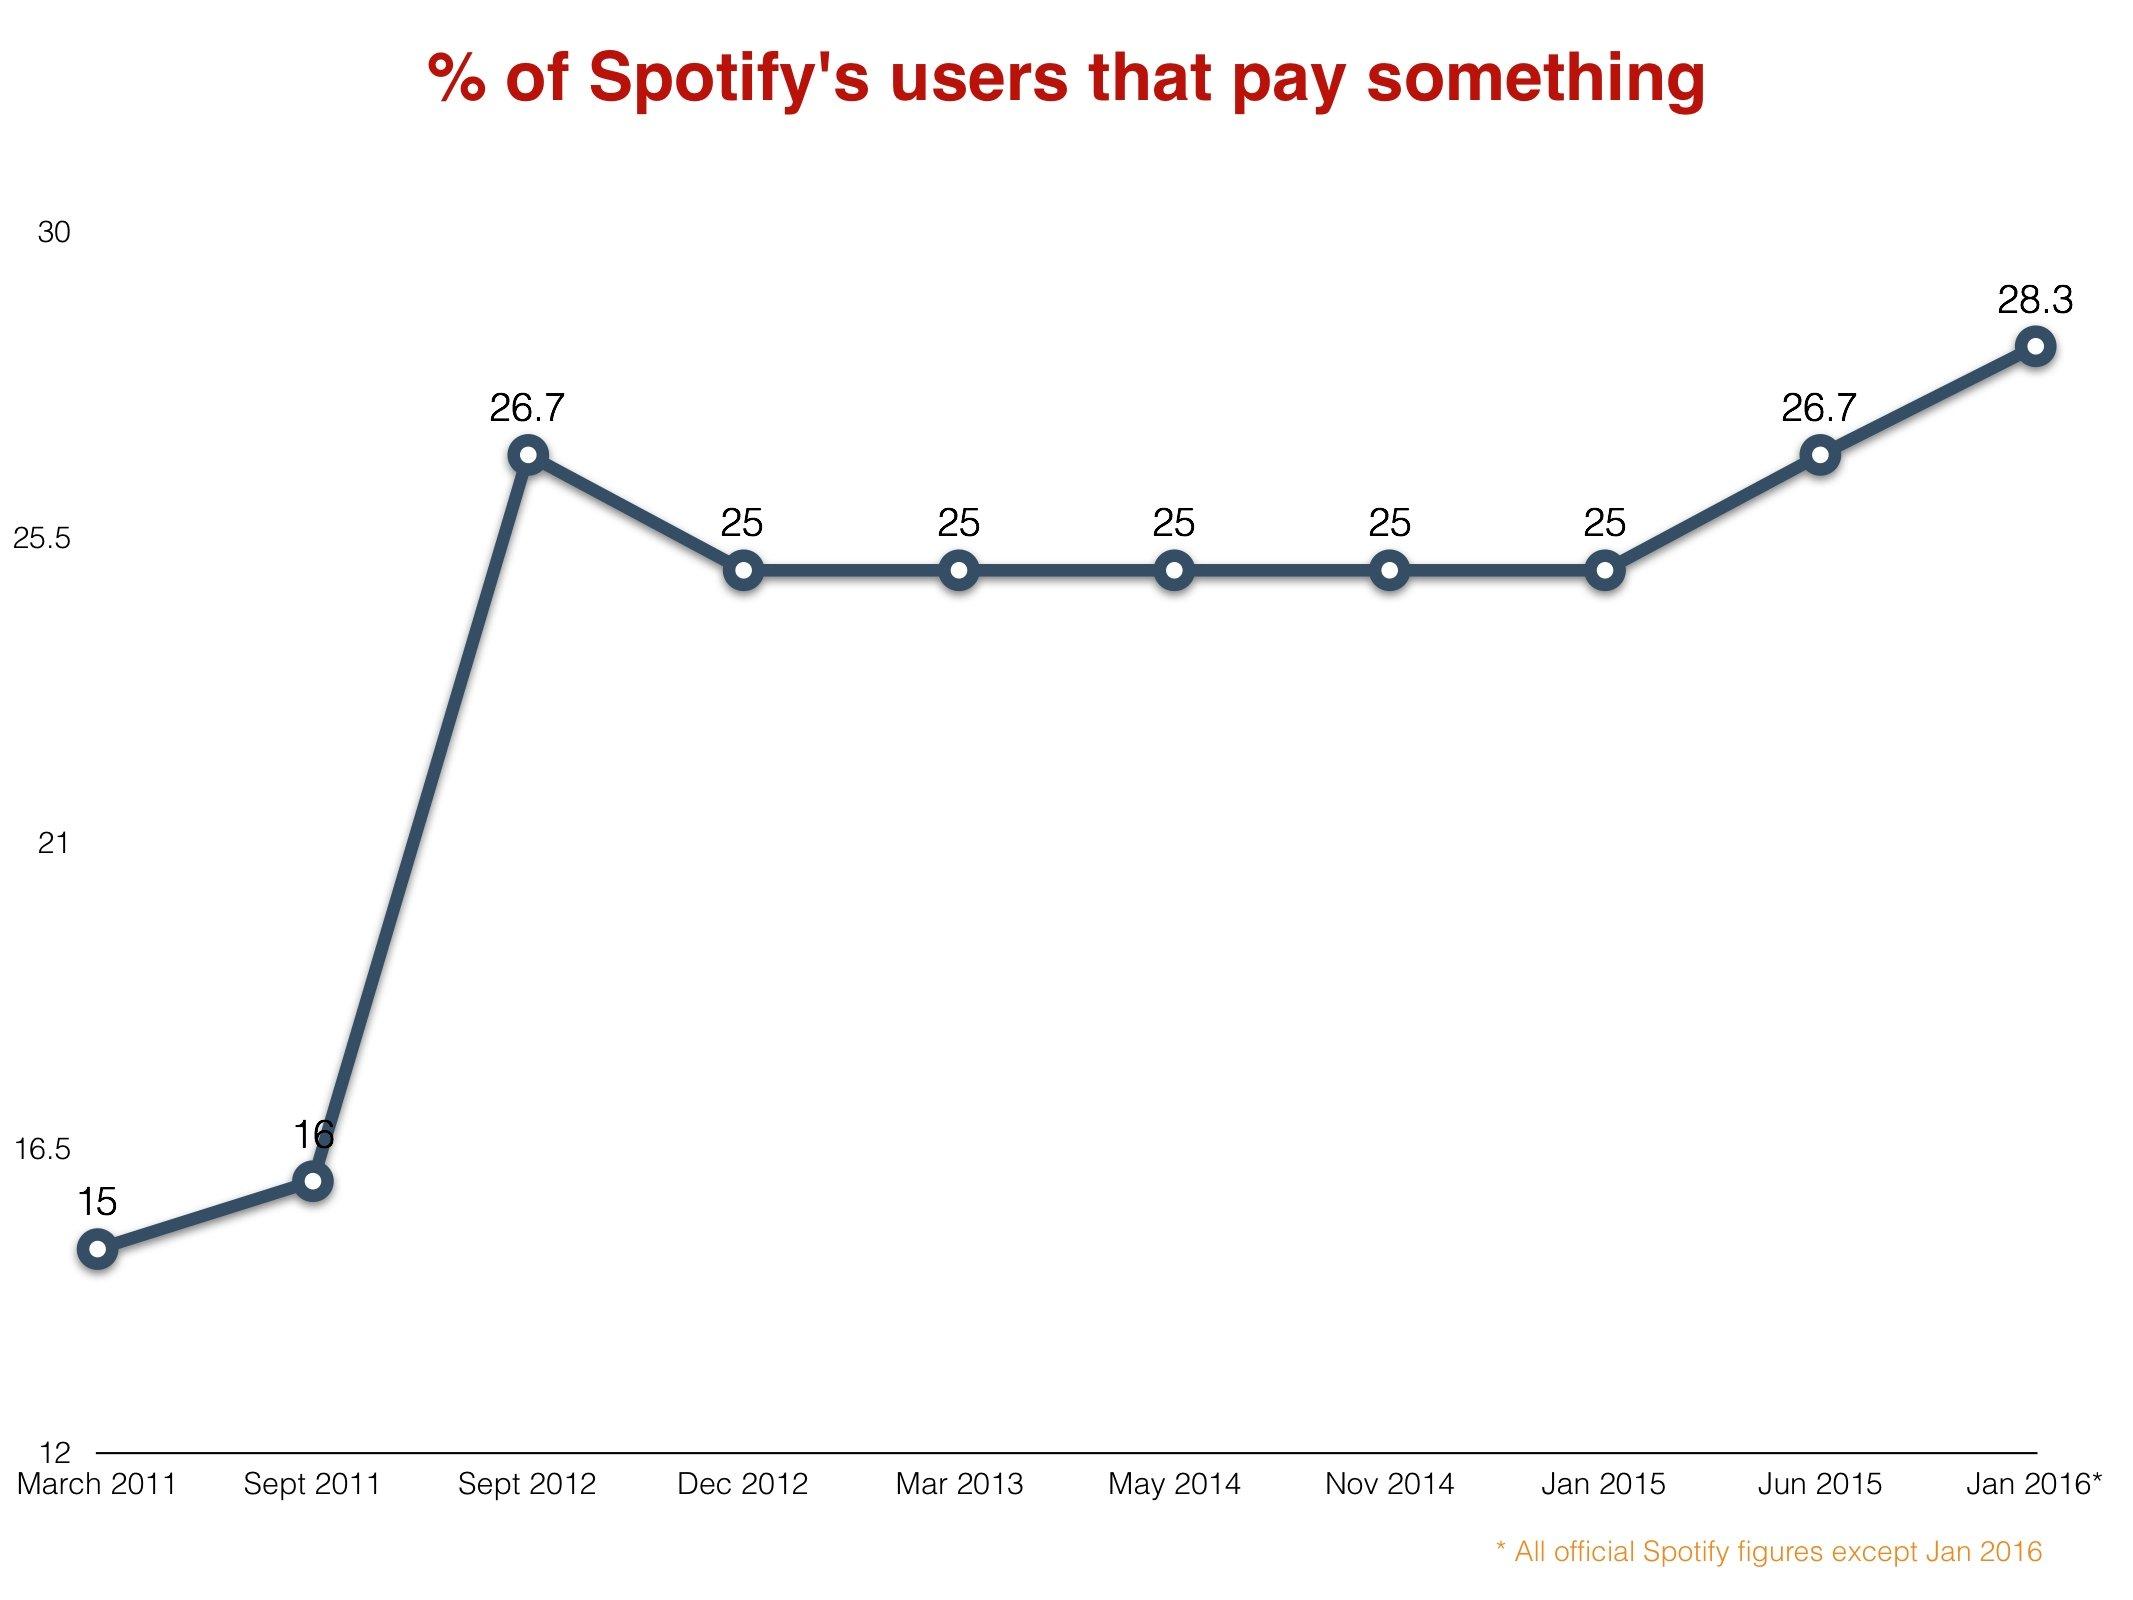 Spotifypercentage